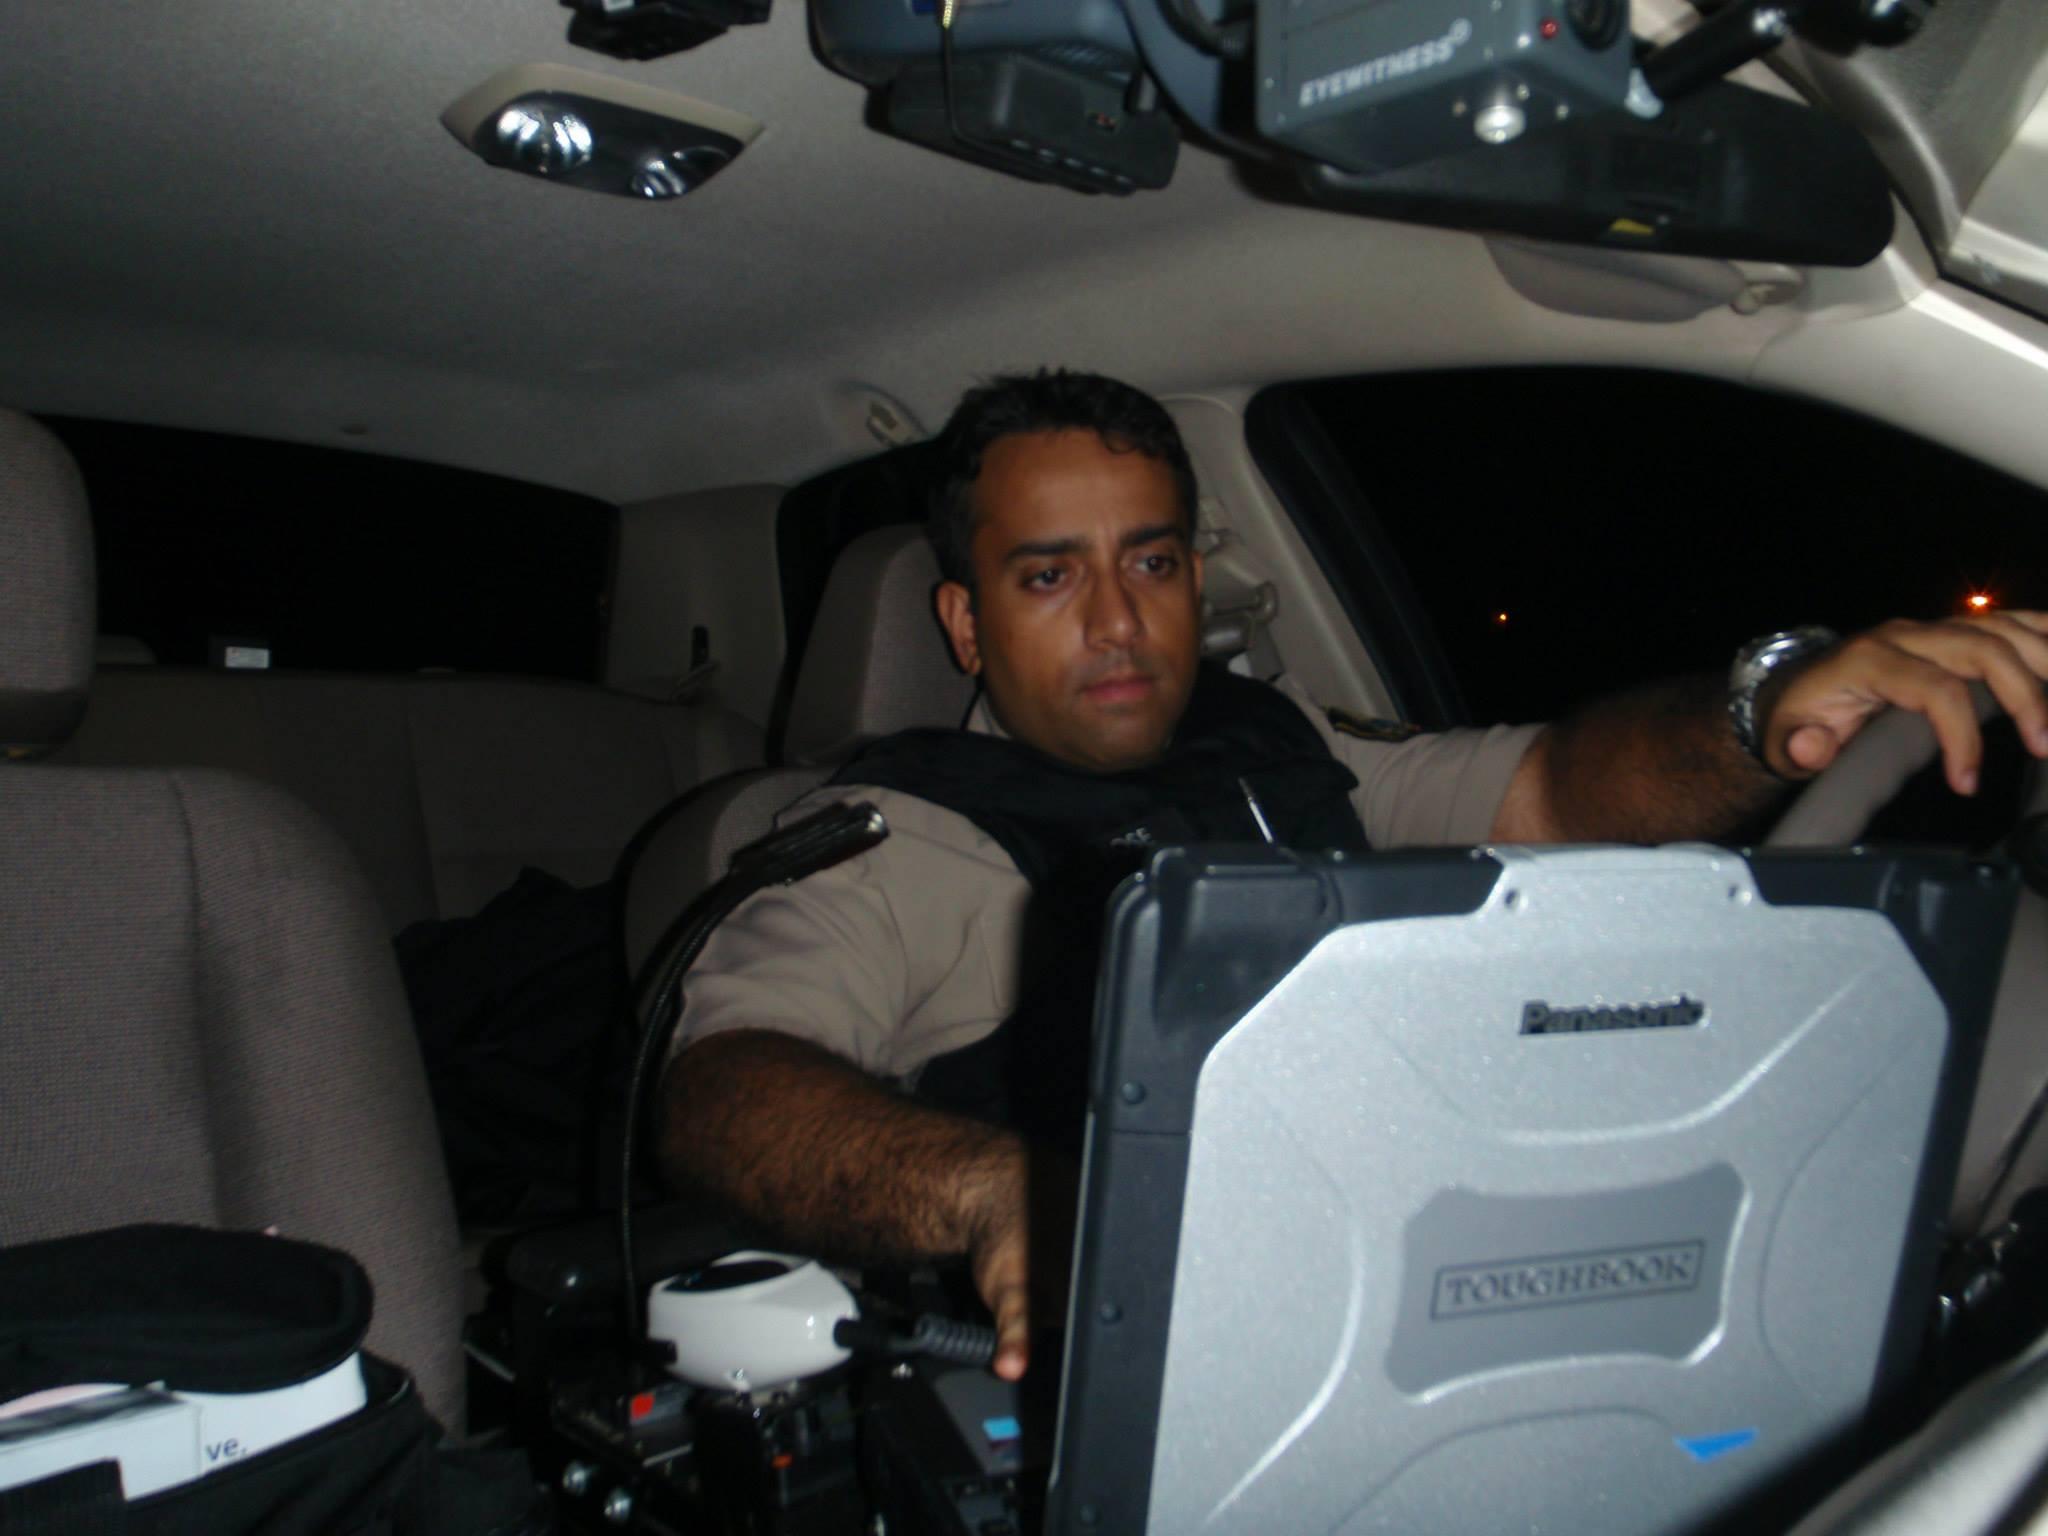 Officer Sudeep Bose